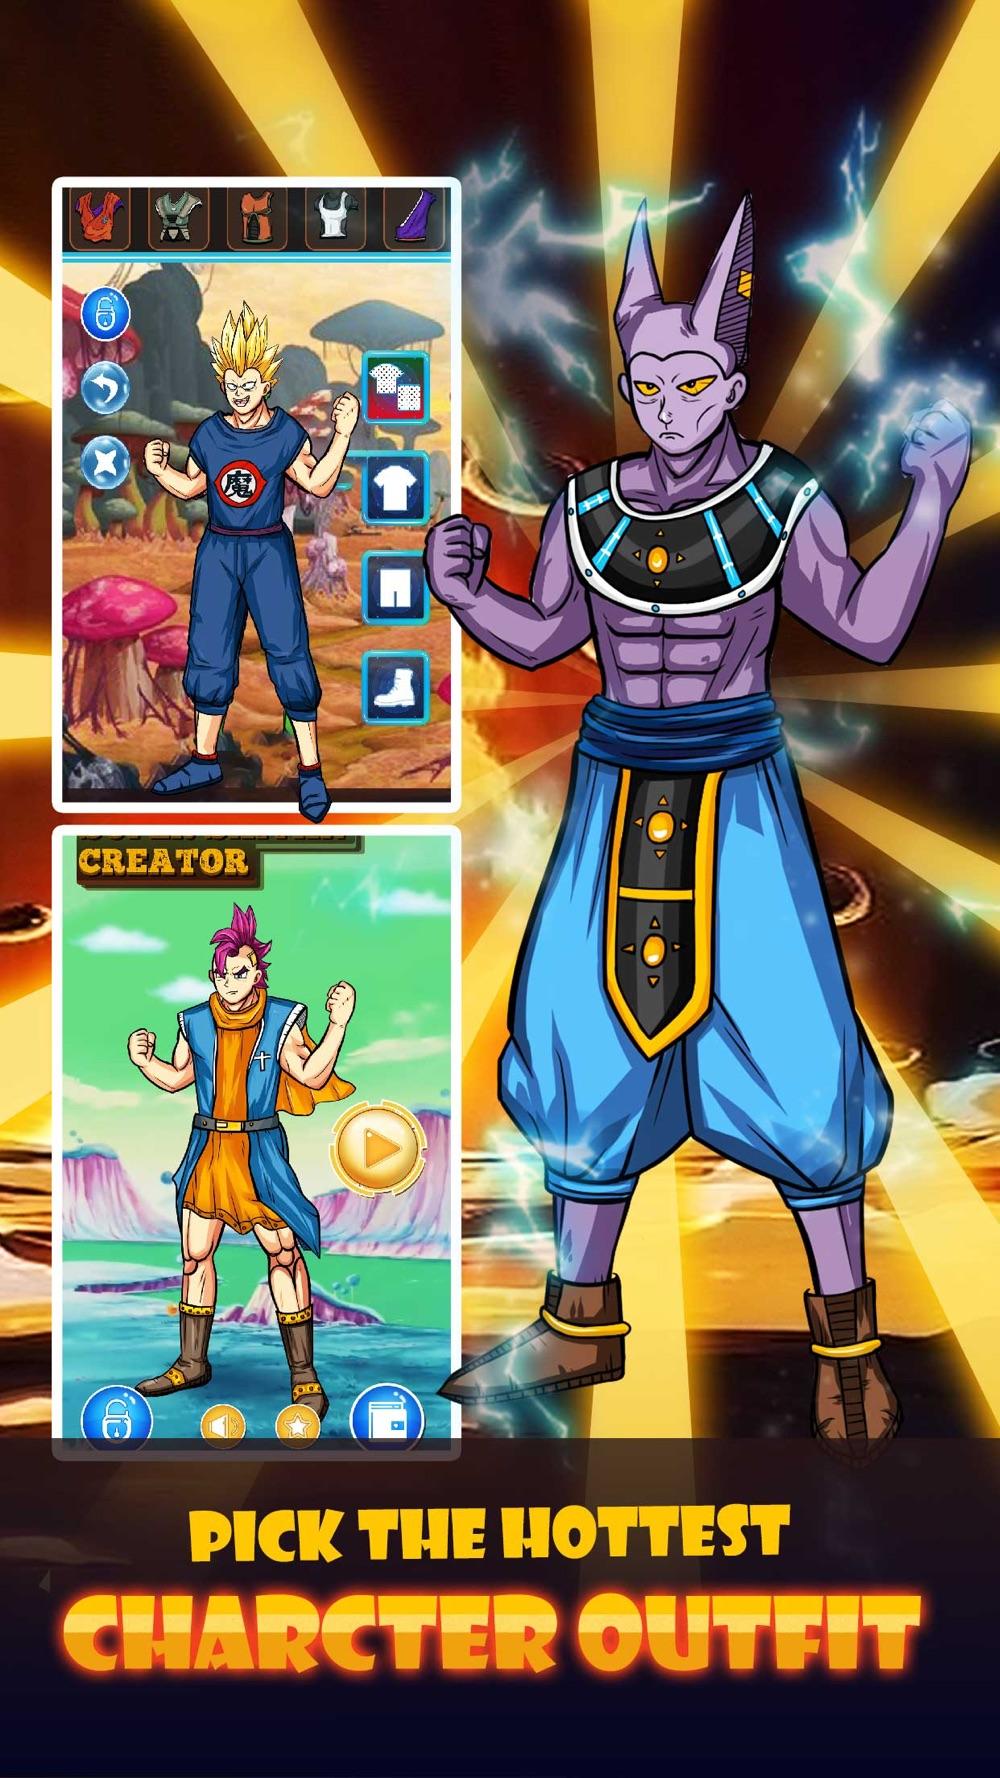 Super Saiyan DressUp - for Dragon Ball Z Heros hack tool